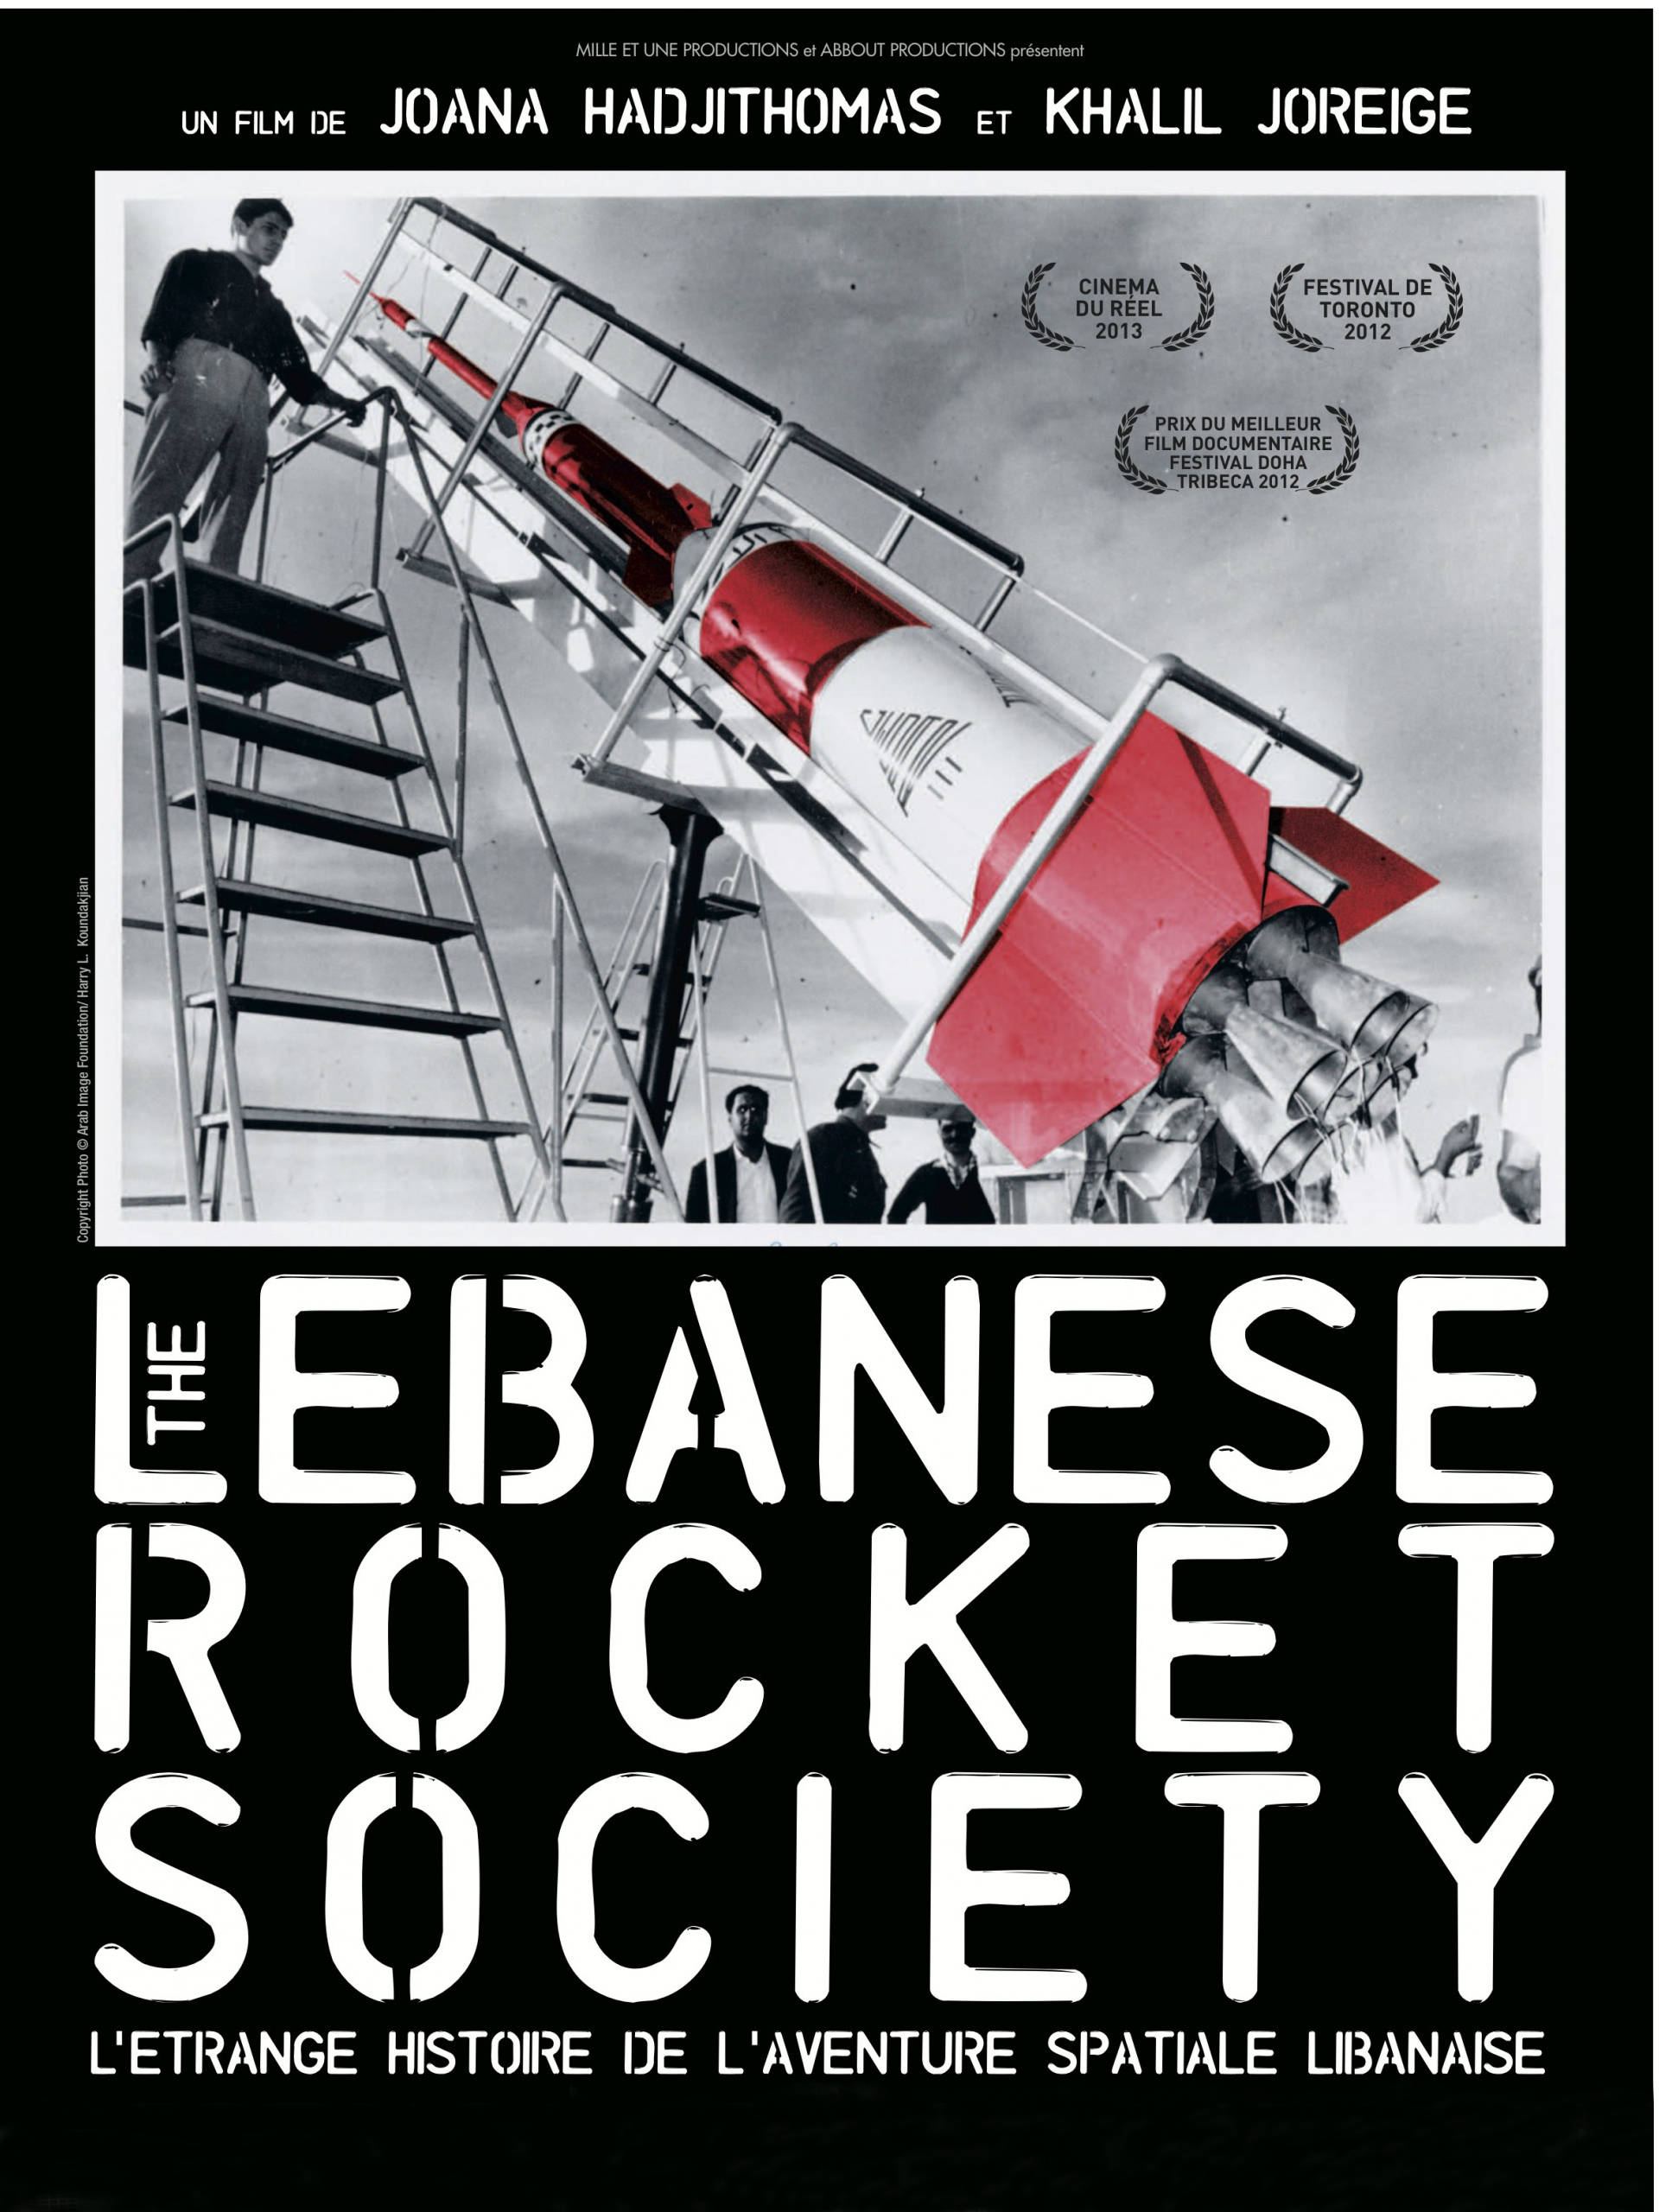 The Lebanese Rocket Society | Hadjithomas, Joana (Réalisateur)